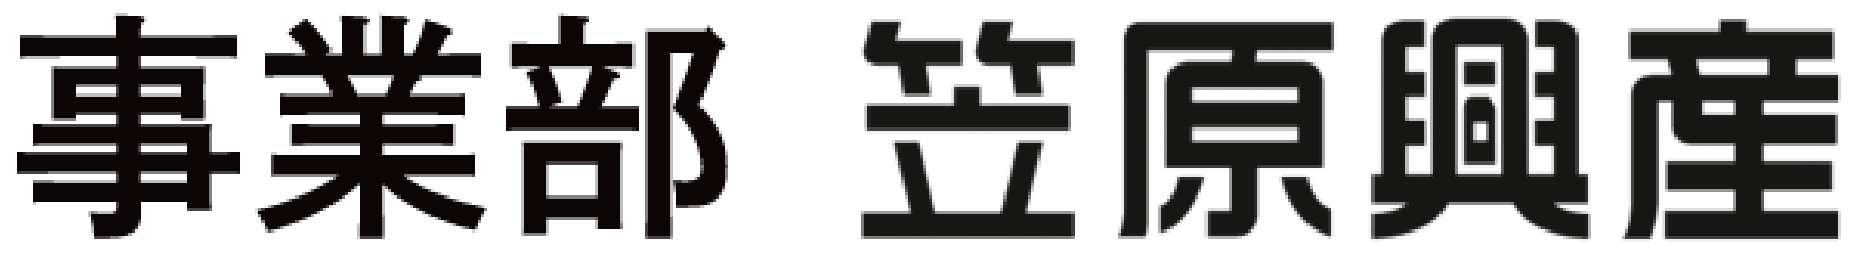 笠原興産 神田給油所ロゴ